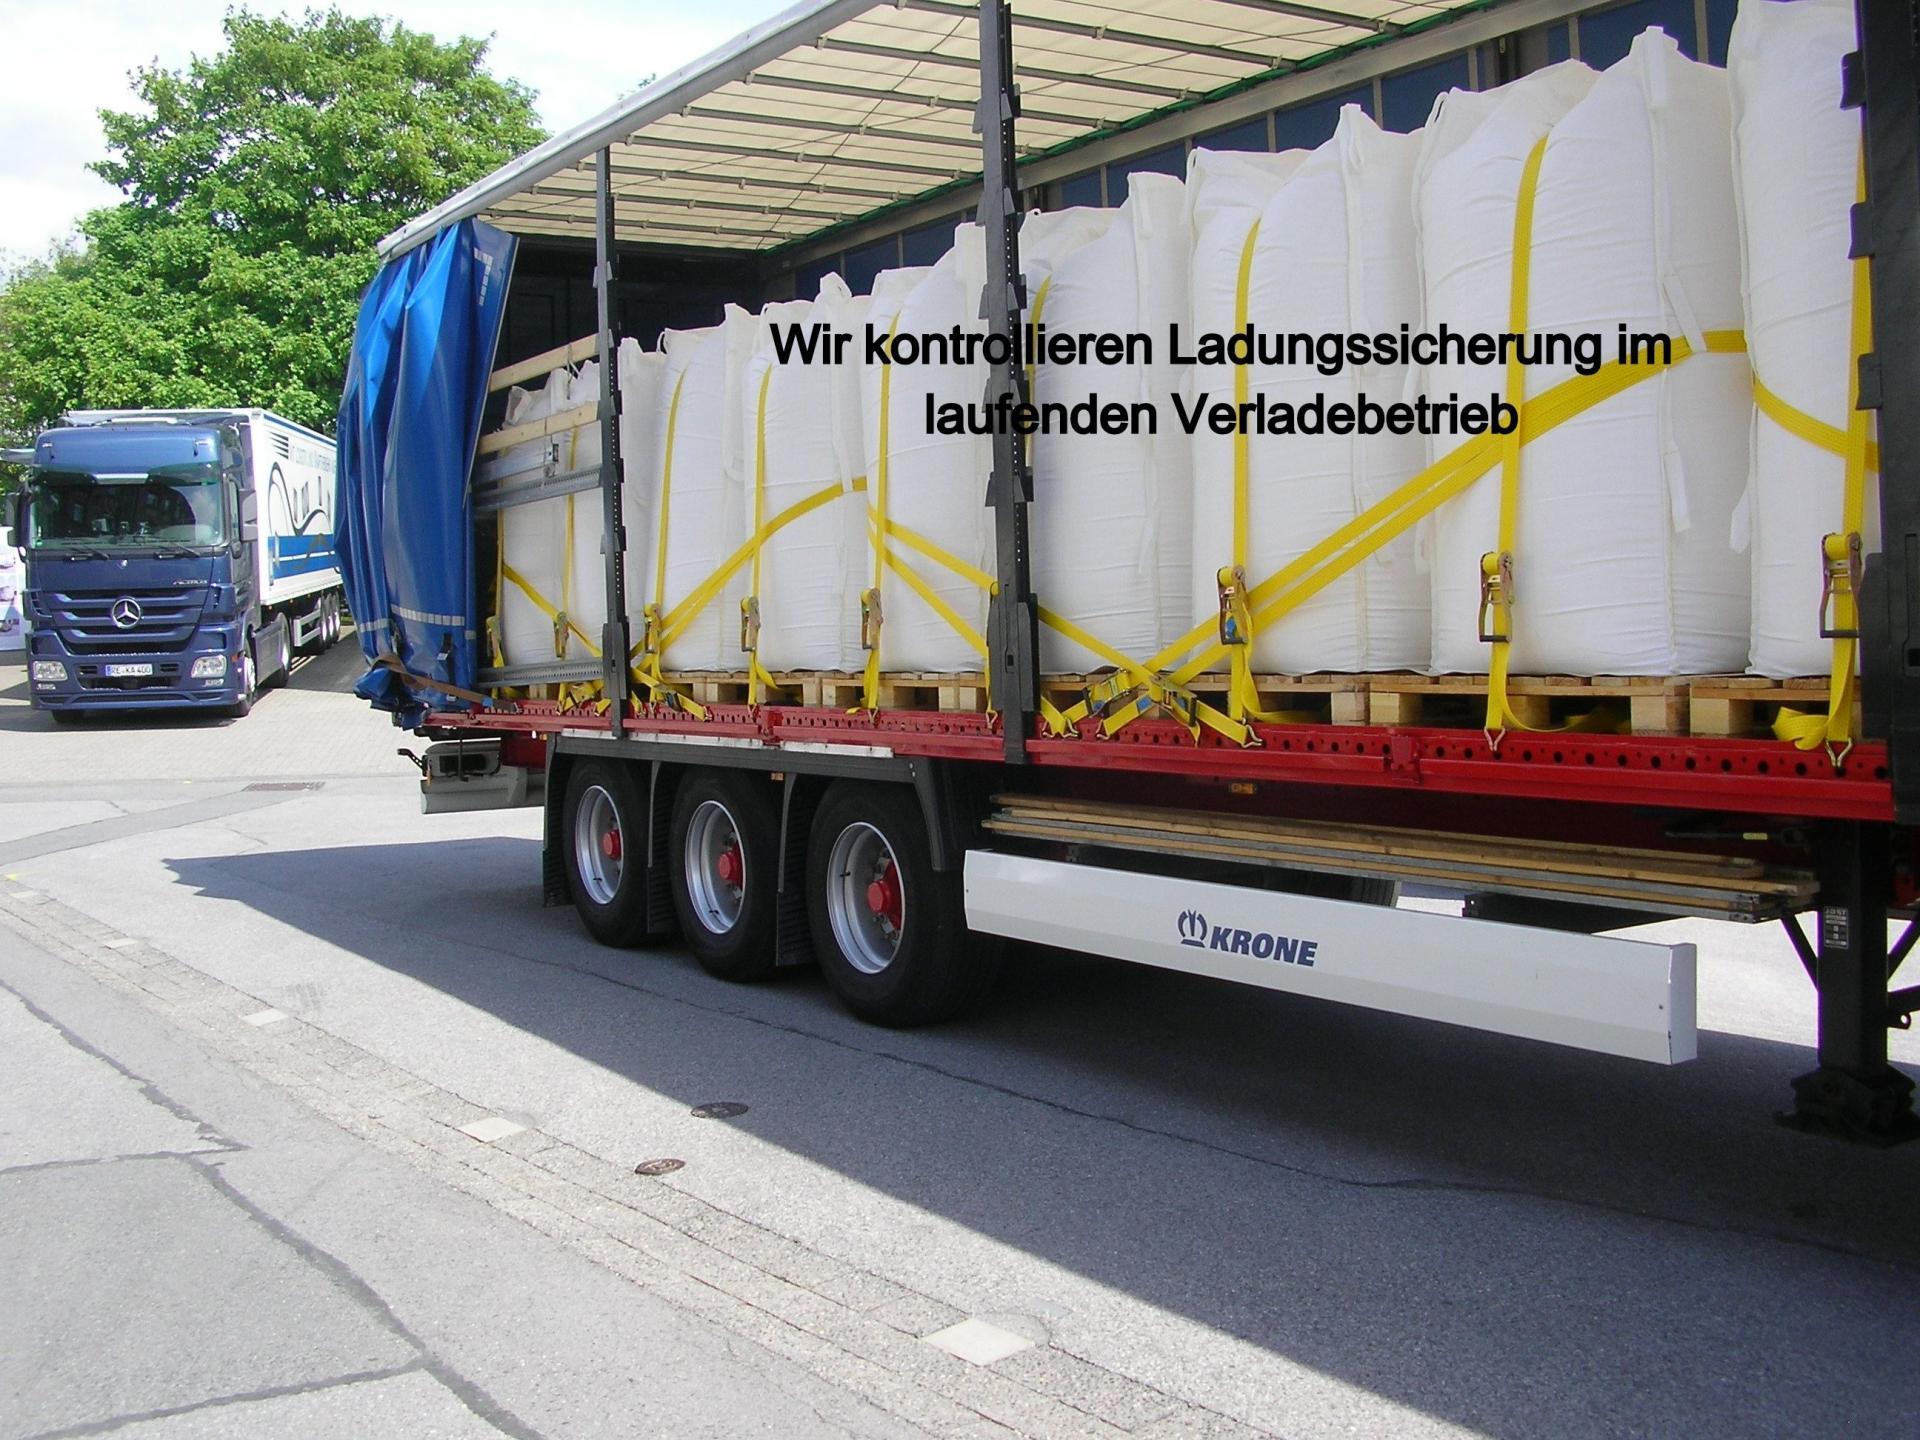 Ladungssicherung1